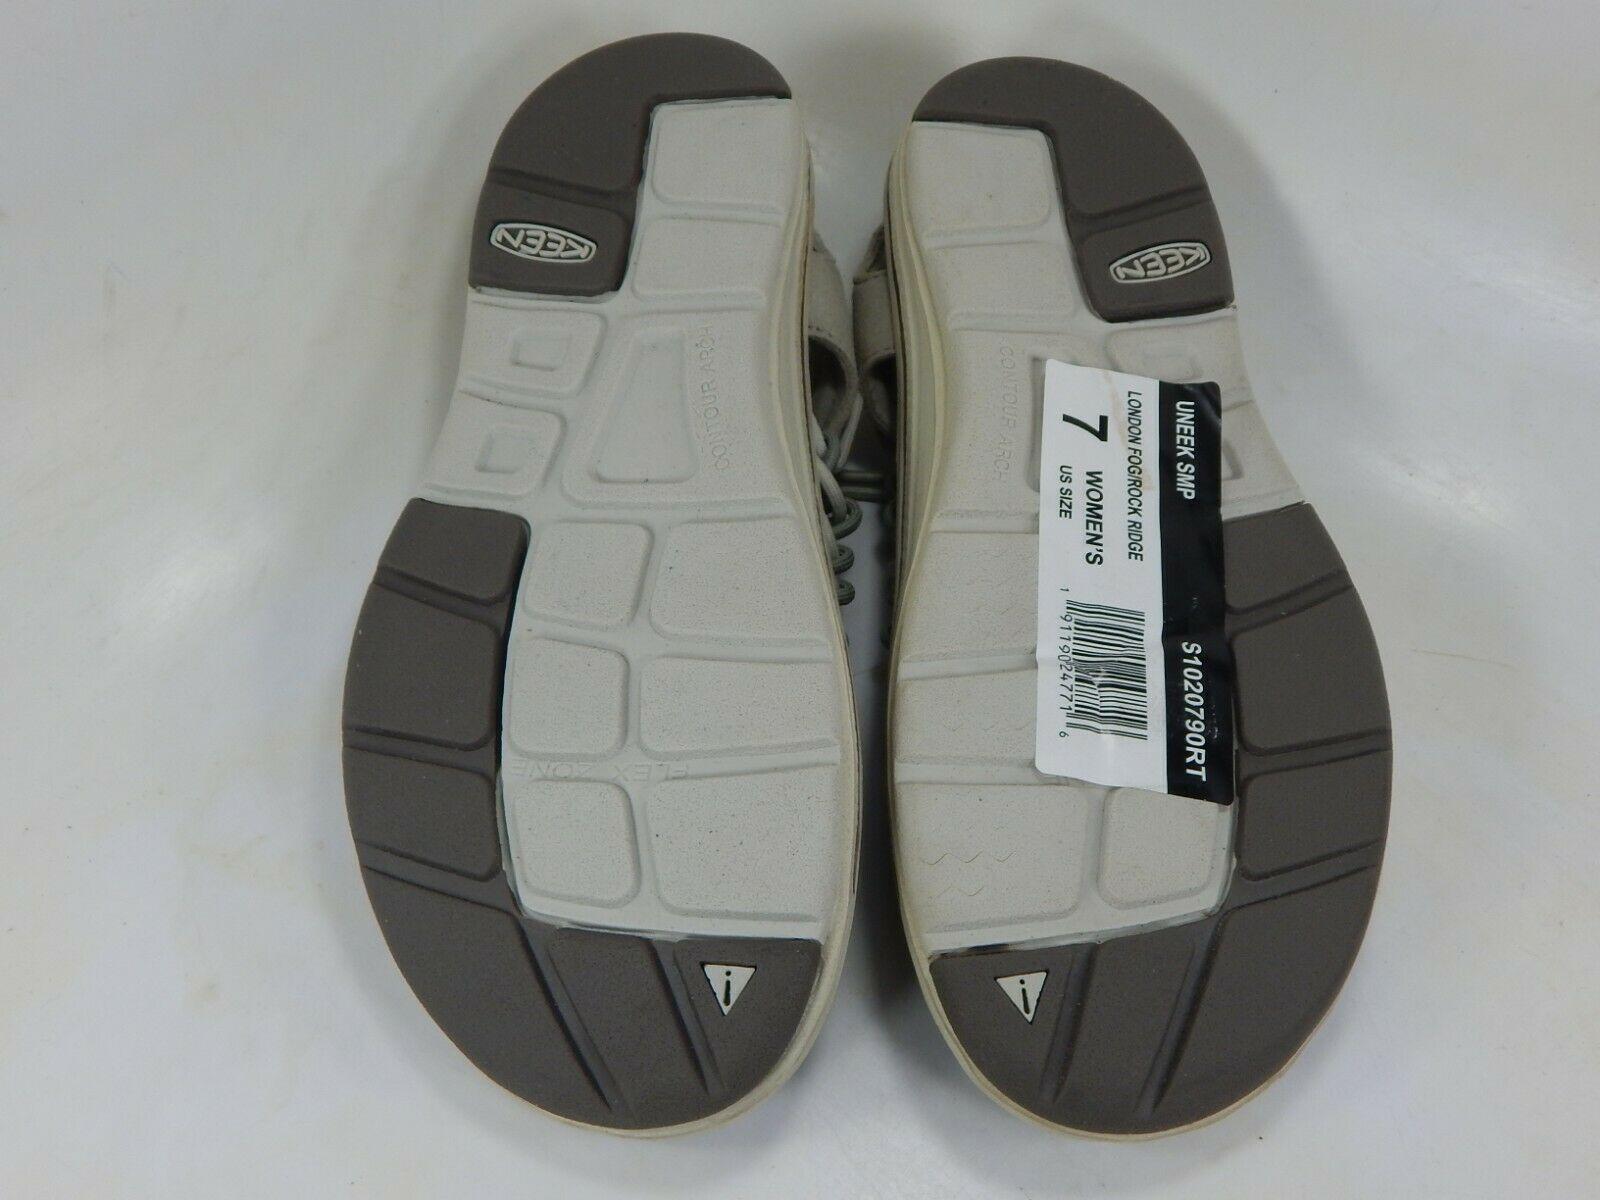 Keen Uneek Größe 7 M (B) Eu 37,5 Damen Sport Sandalen Schuhe London Nebel